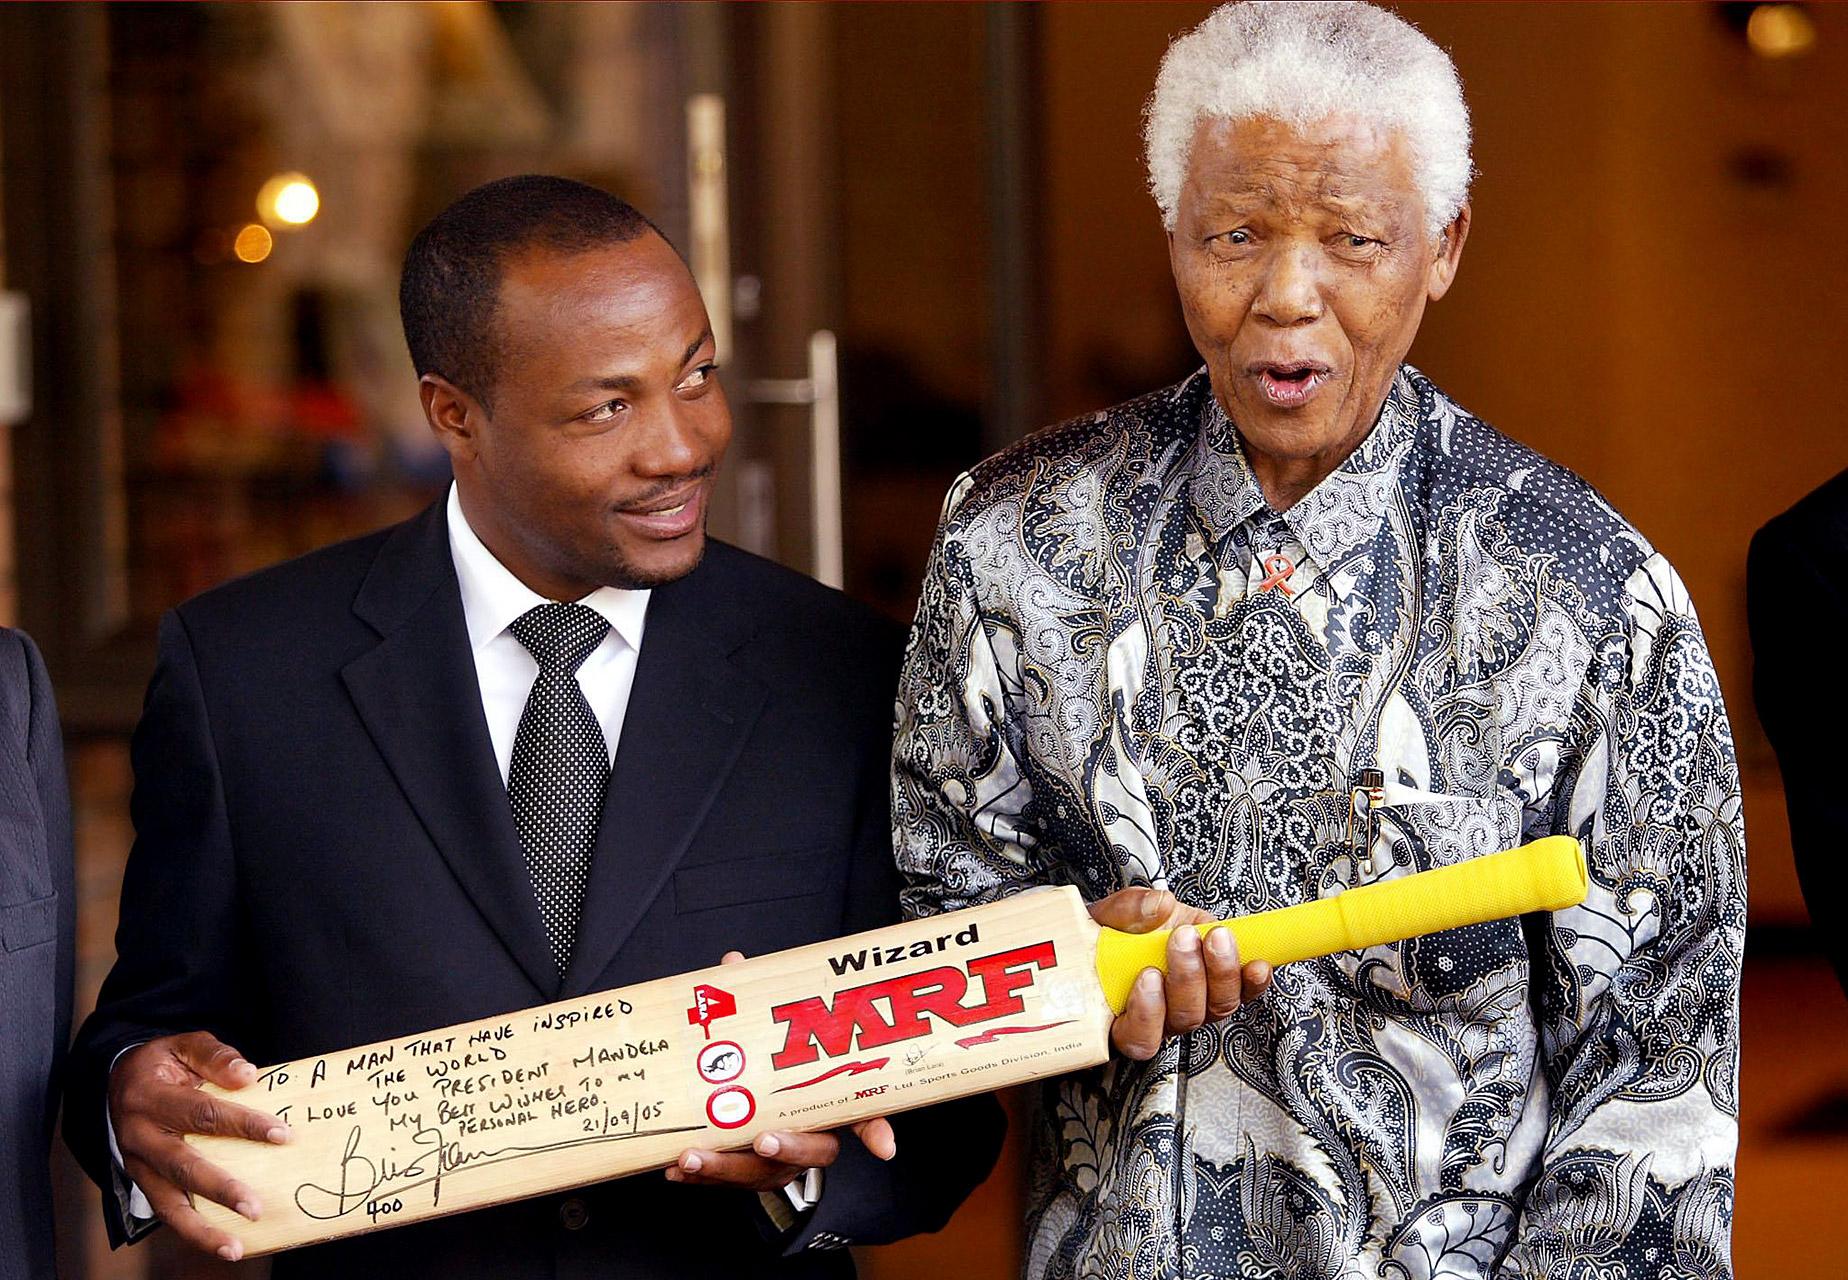 Brian Lara and Nelson Mandela